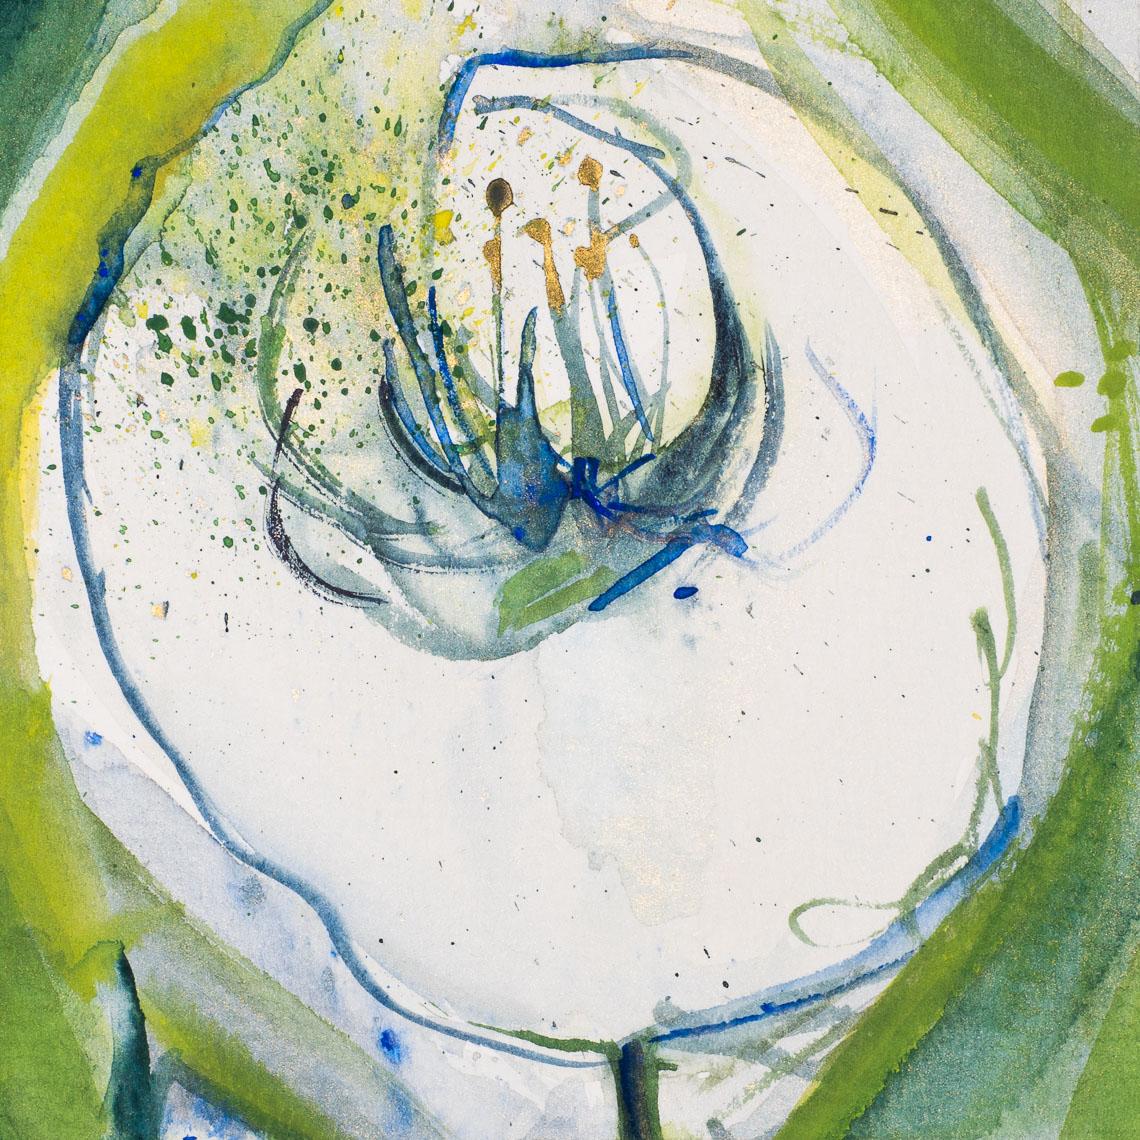 Malerei Workshop Malkurs Workshops Malkurse Braunschweig Aquarell